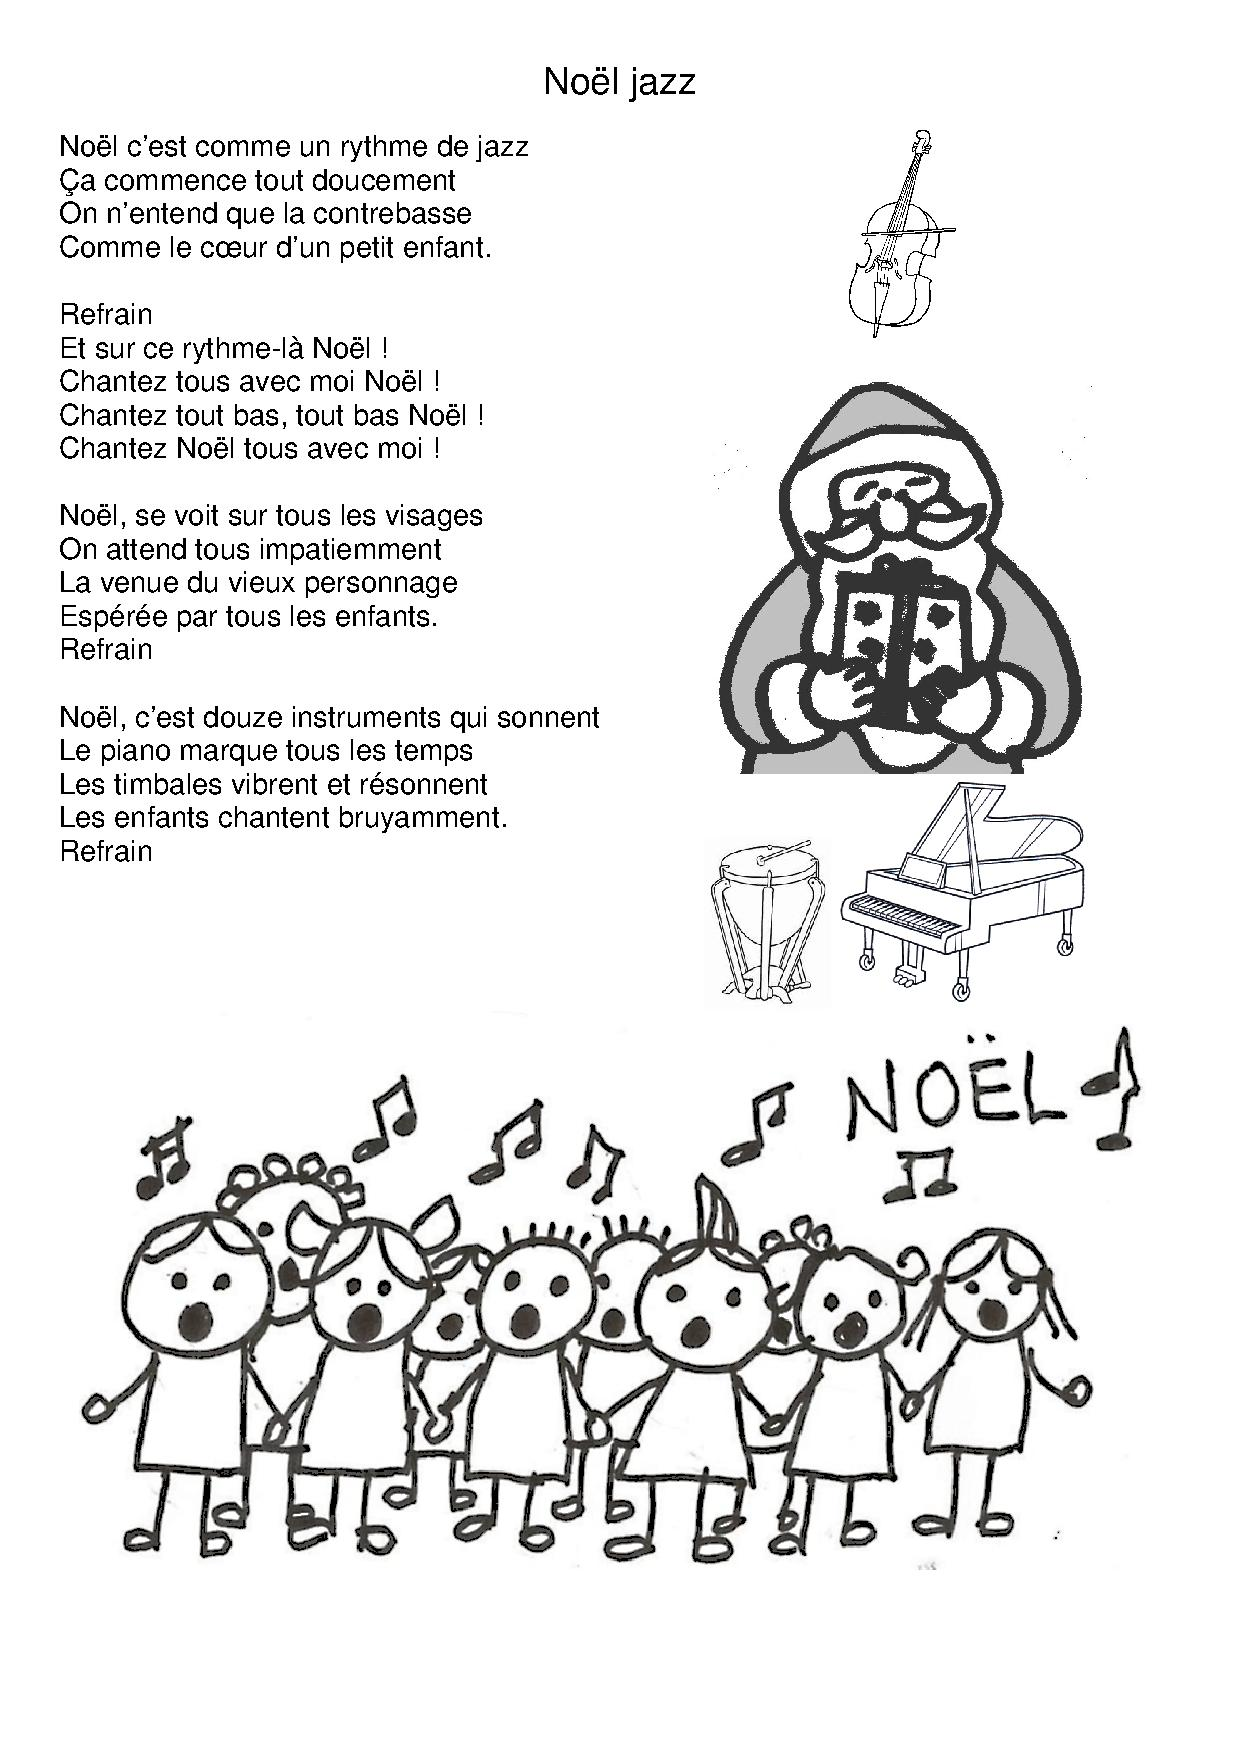 chanson de noel rythme